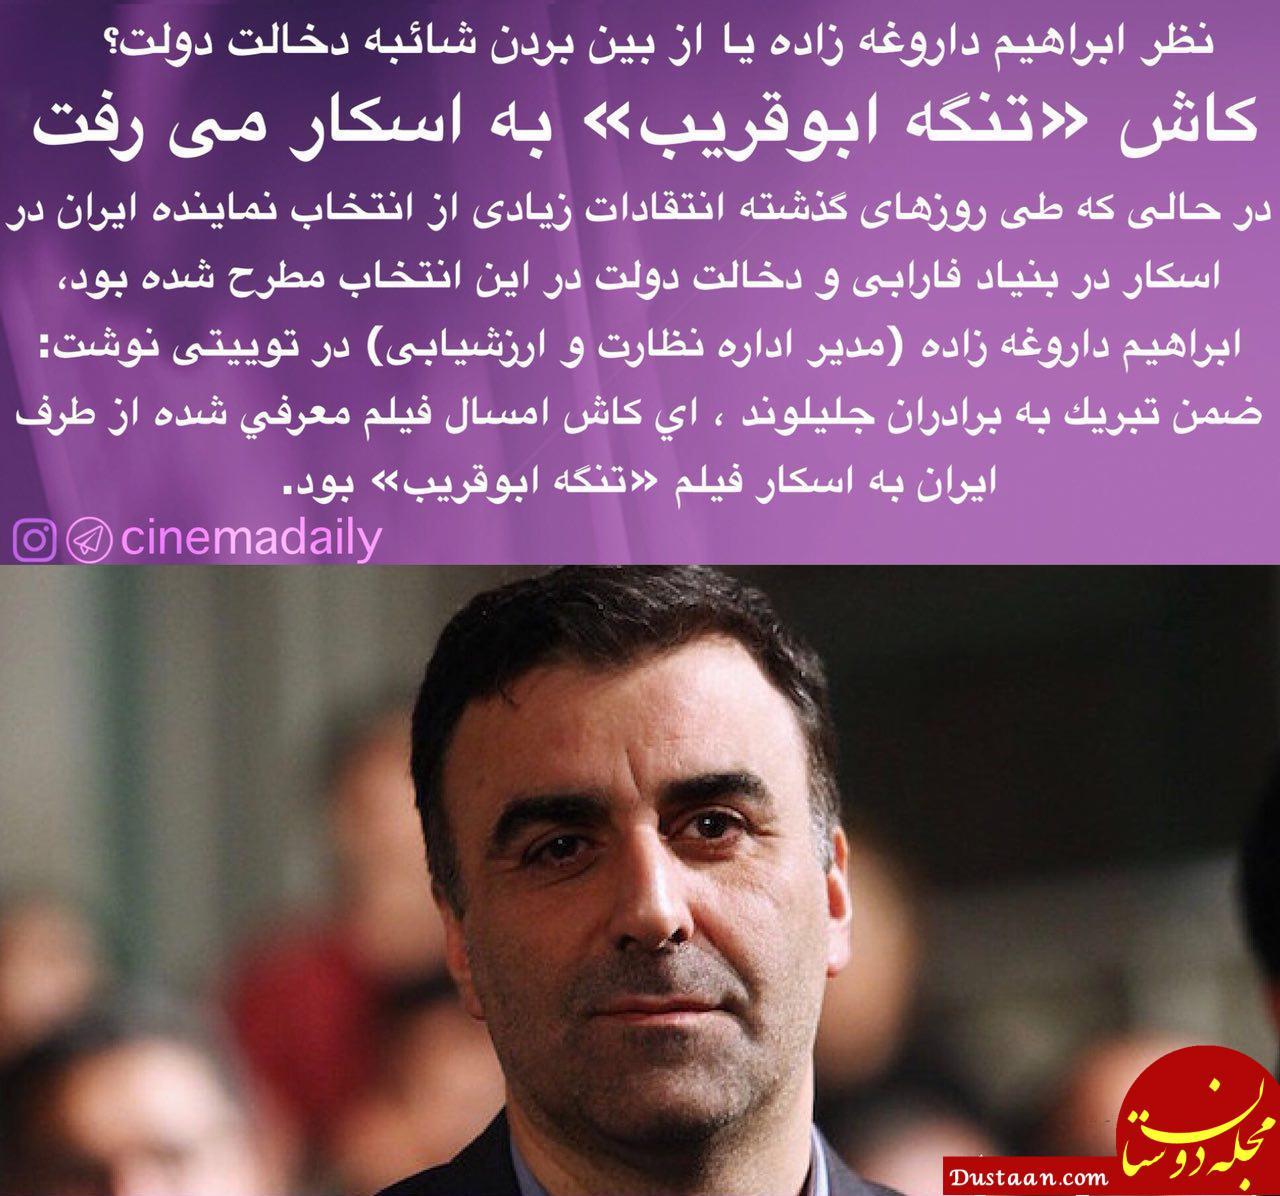 www.dustaan.com ابراهیم داروغه زاده: کاش «تنگه ابوقریب» به اسکار می رفت